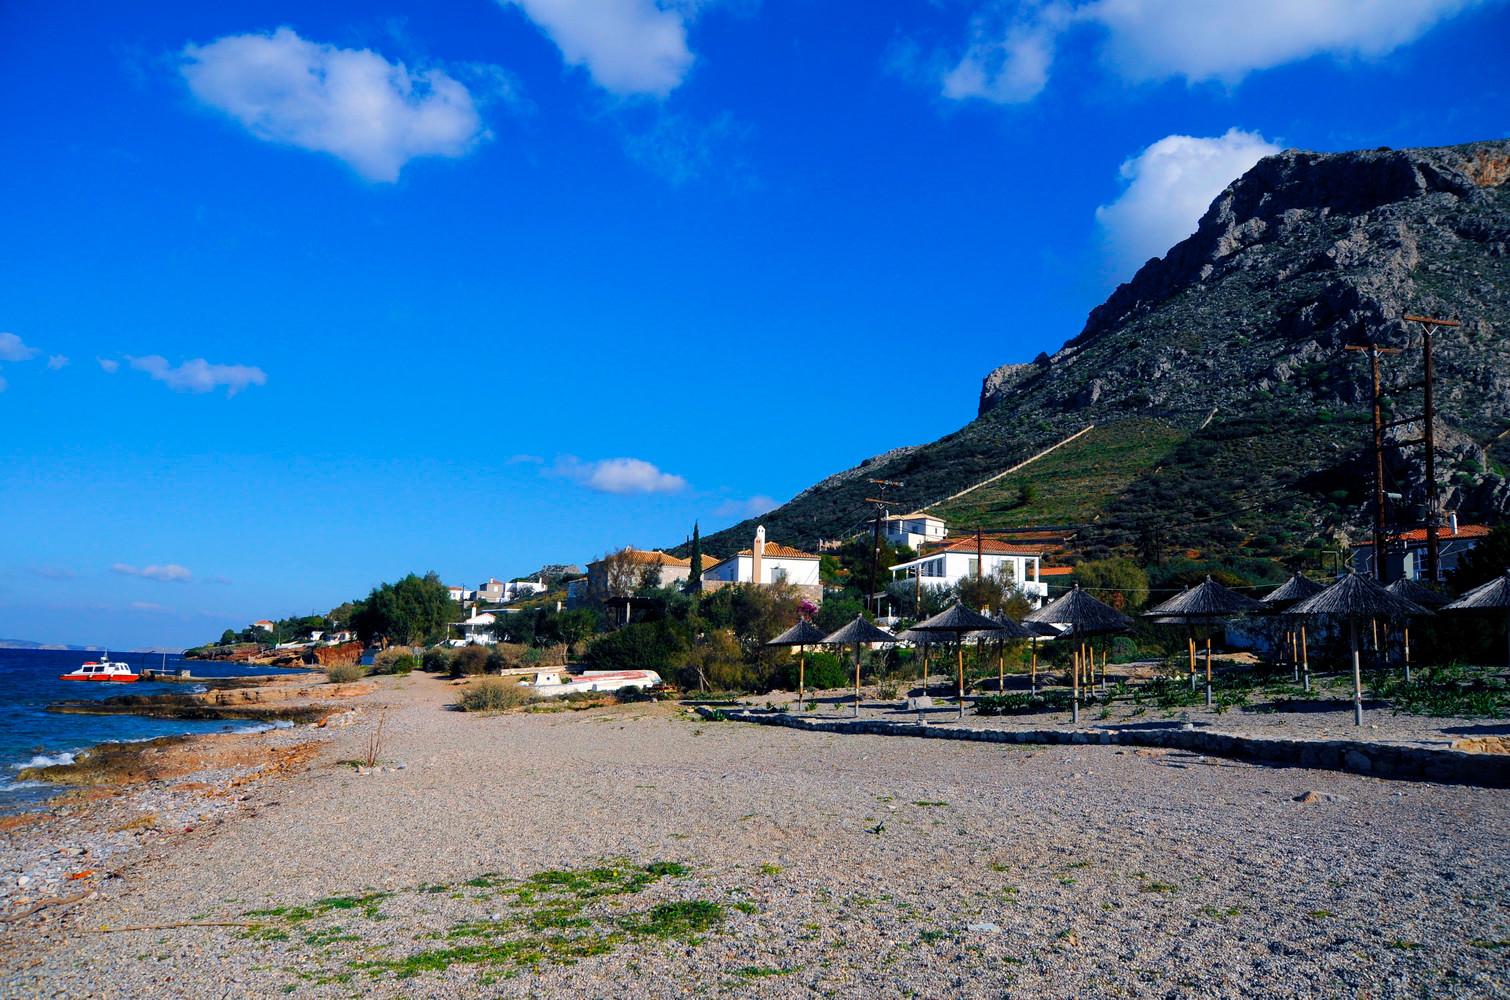 HYDRA VLYCHOS BEACH